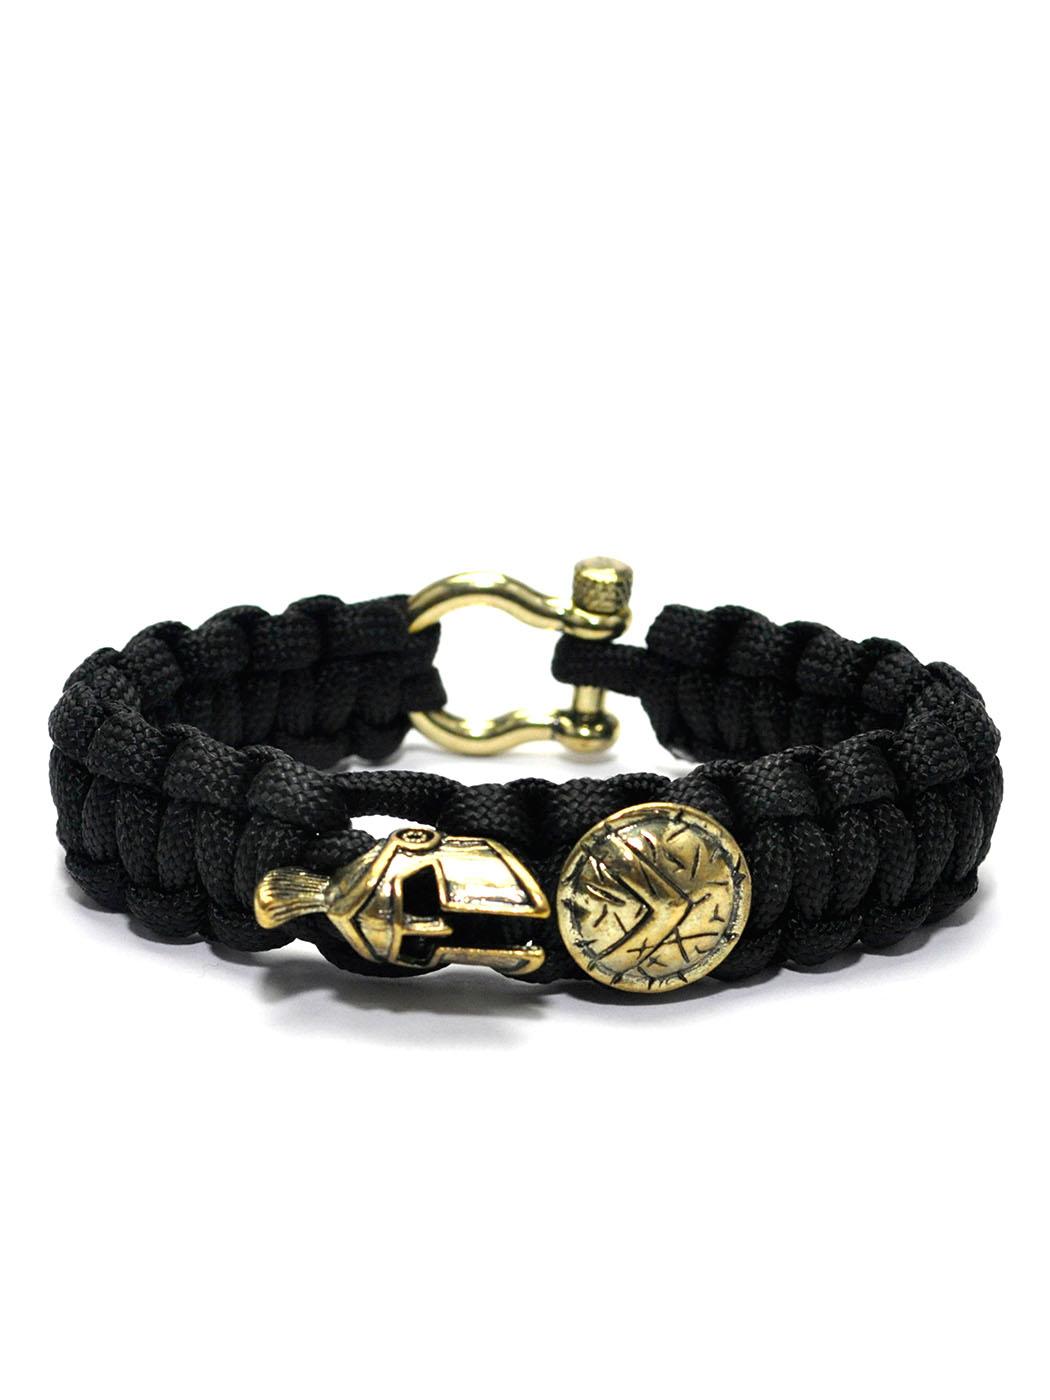 Spartan Bracelet Black,